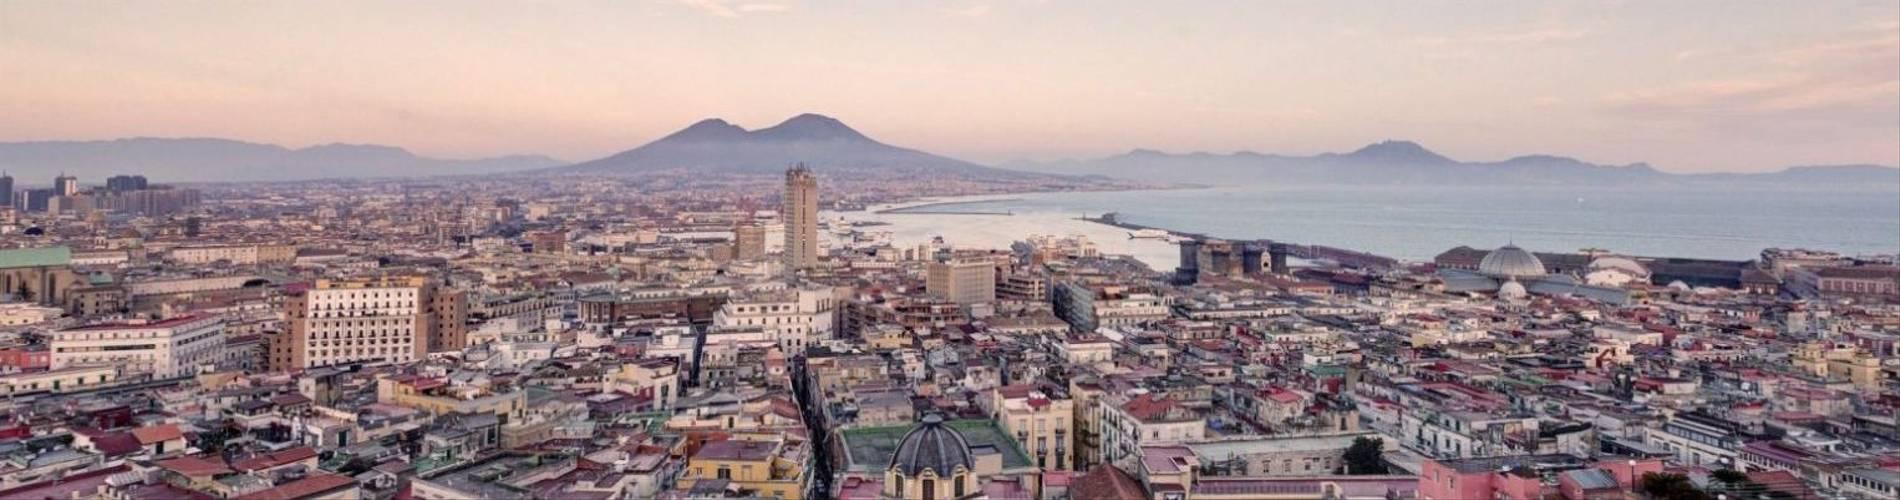 San Francesco Al Monte, Naples, Italy (18).JPG